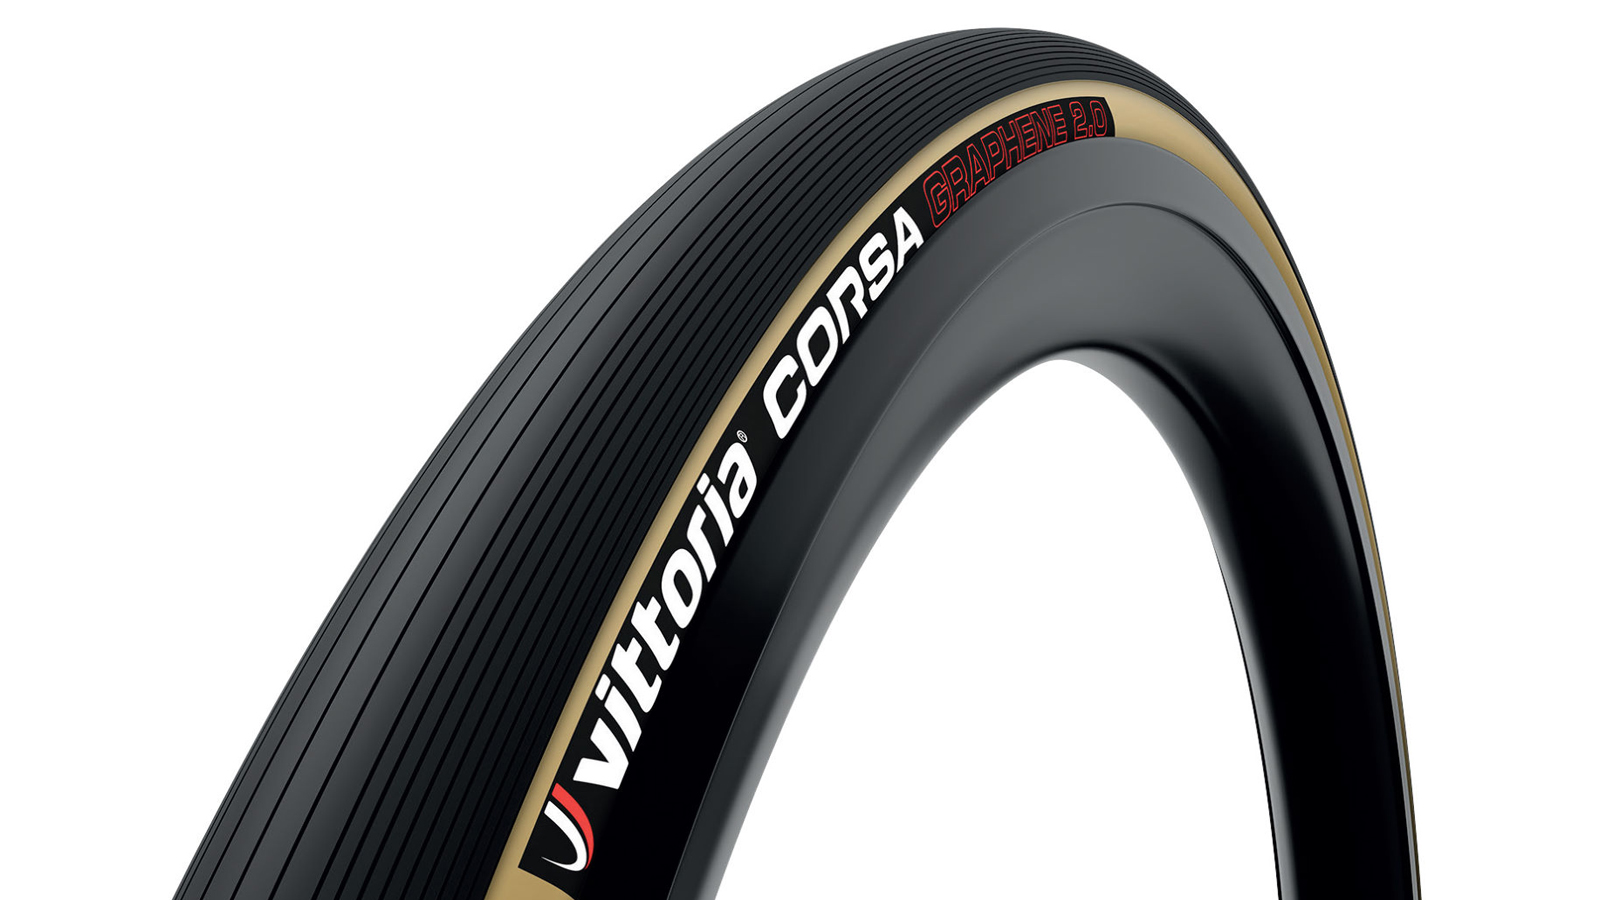 Best Road bike tyres: Vittoria Corsa Graphene 2 tyre